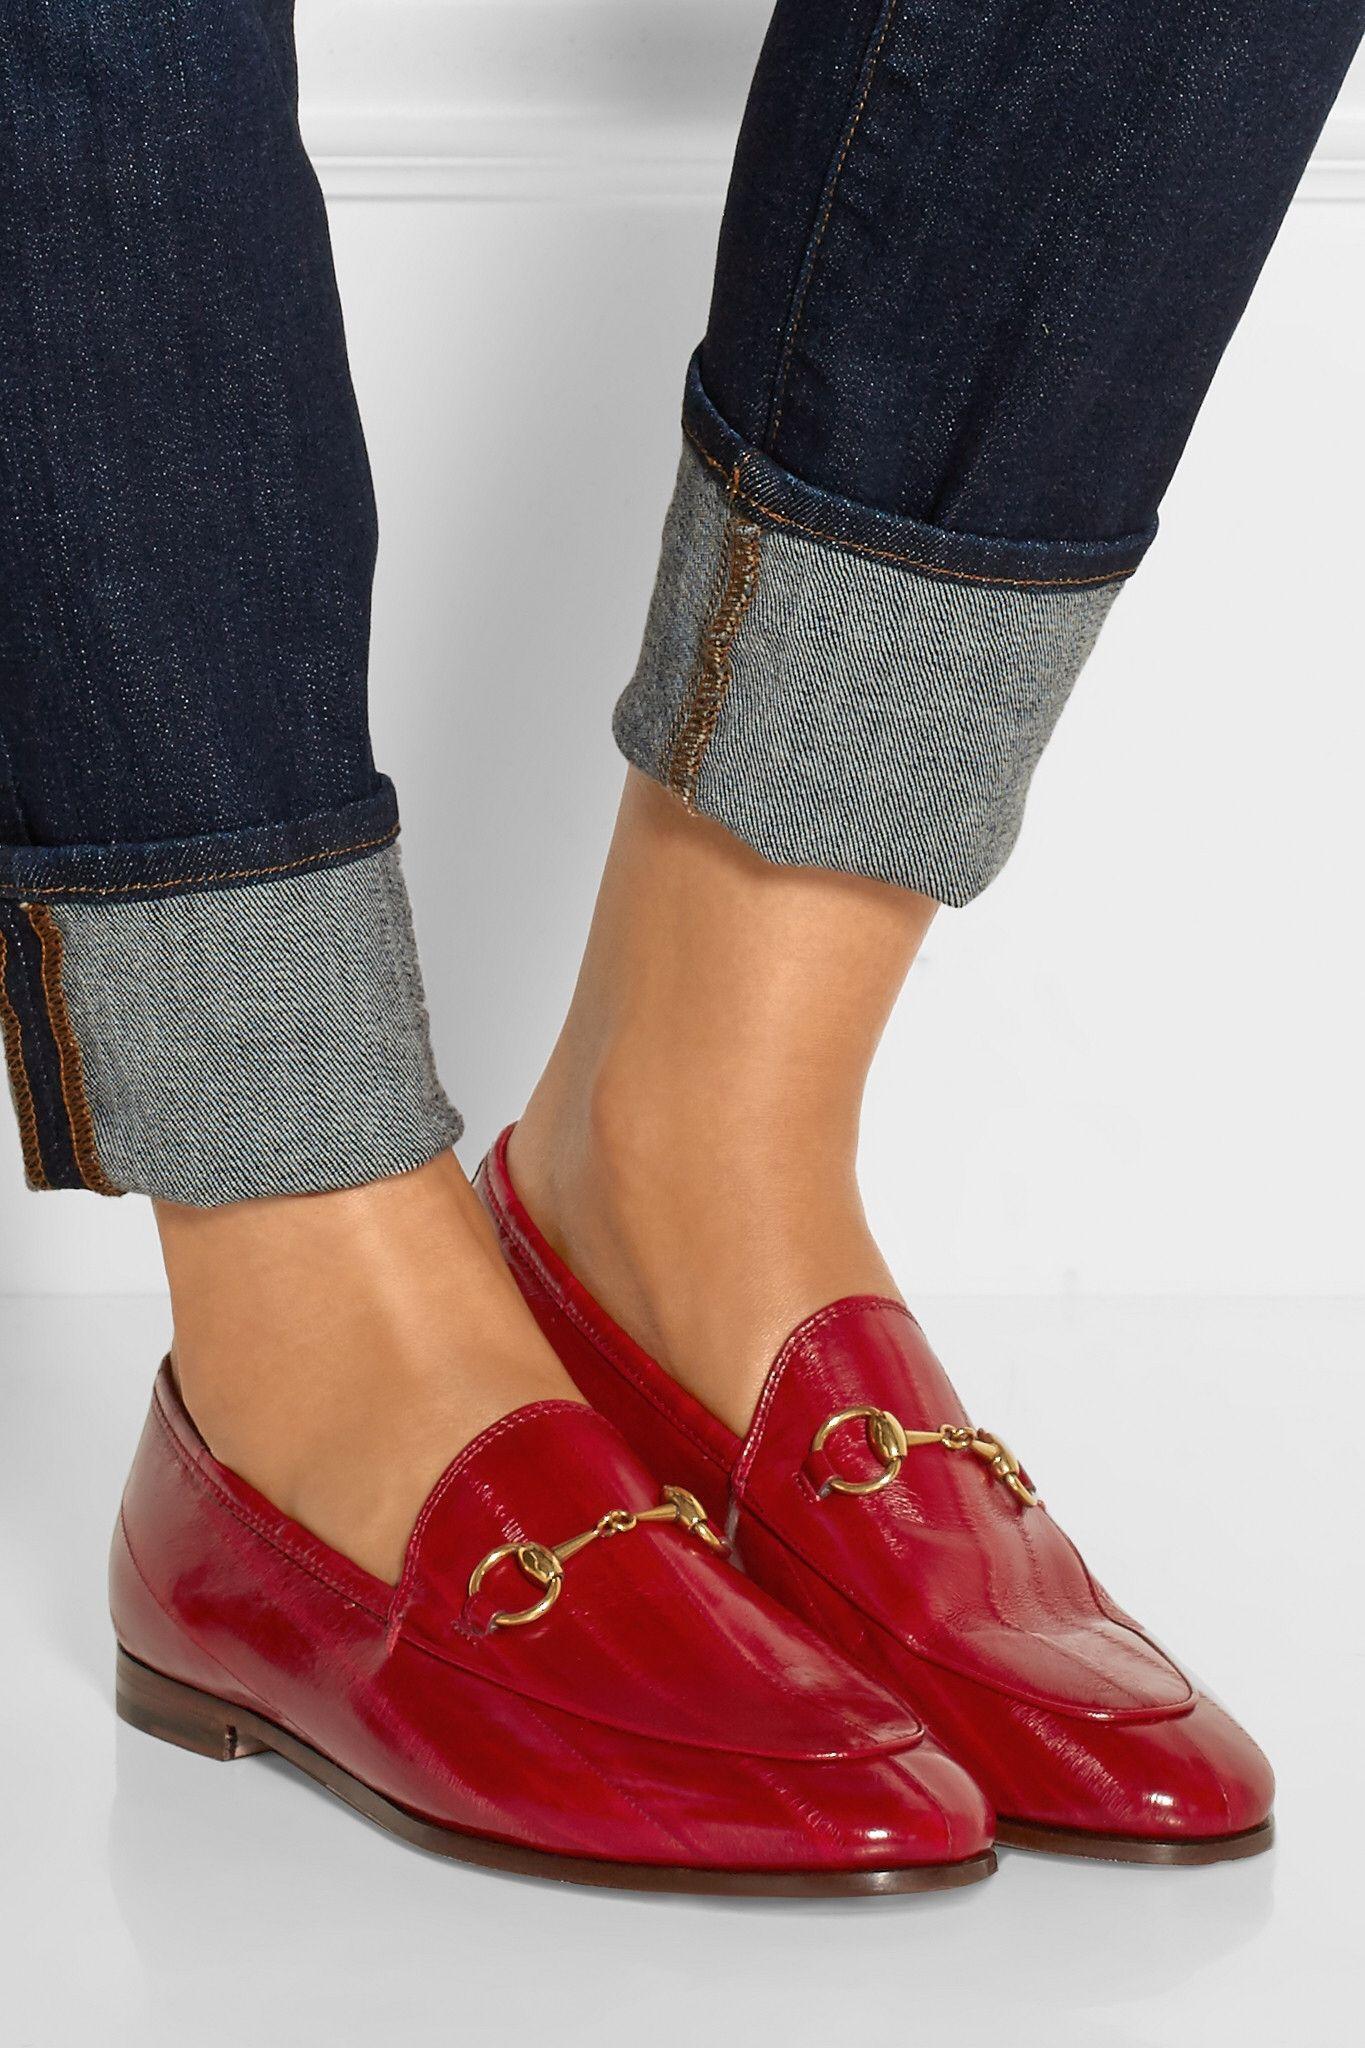 816a675cd56d Pin by New Women Fashion on Gucci Women Fashion | Shoes, Gucci ...